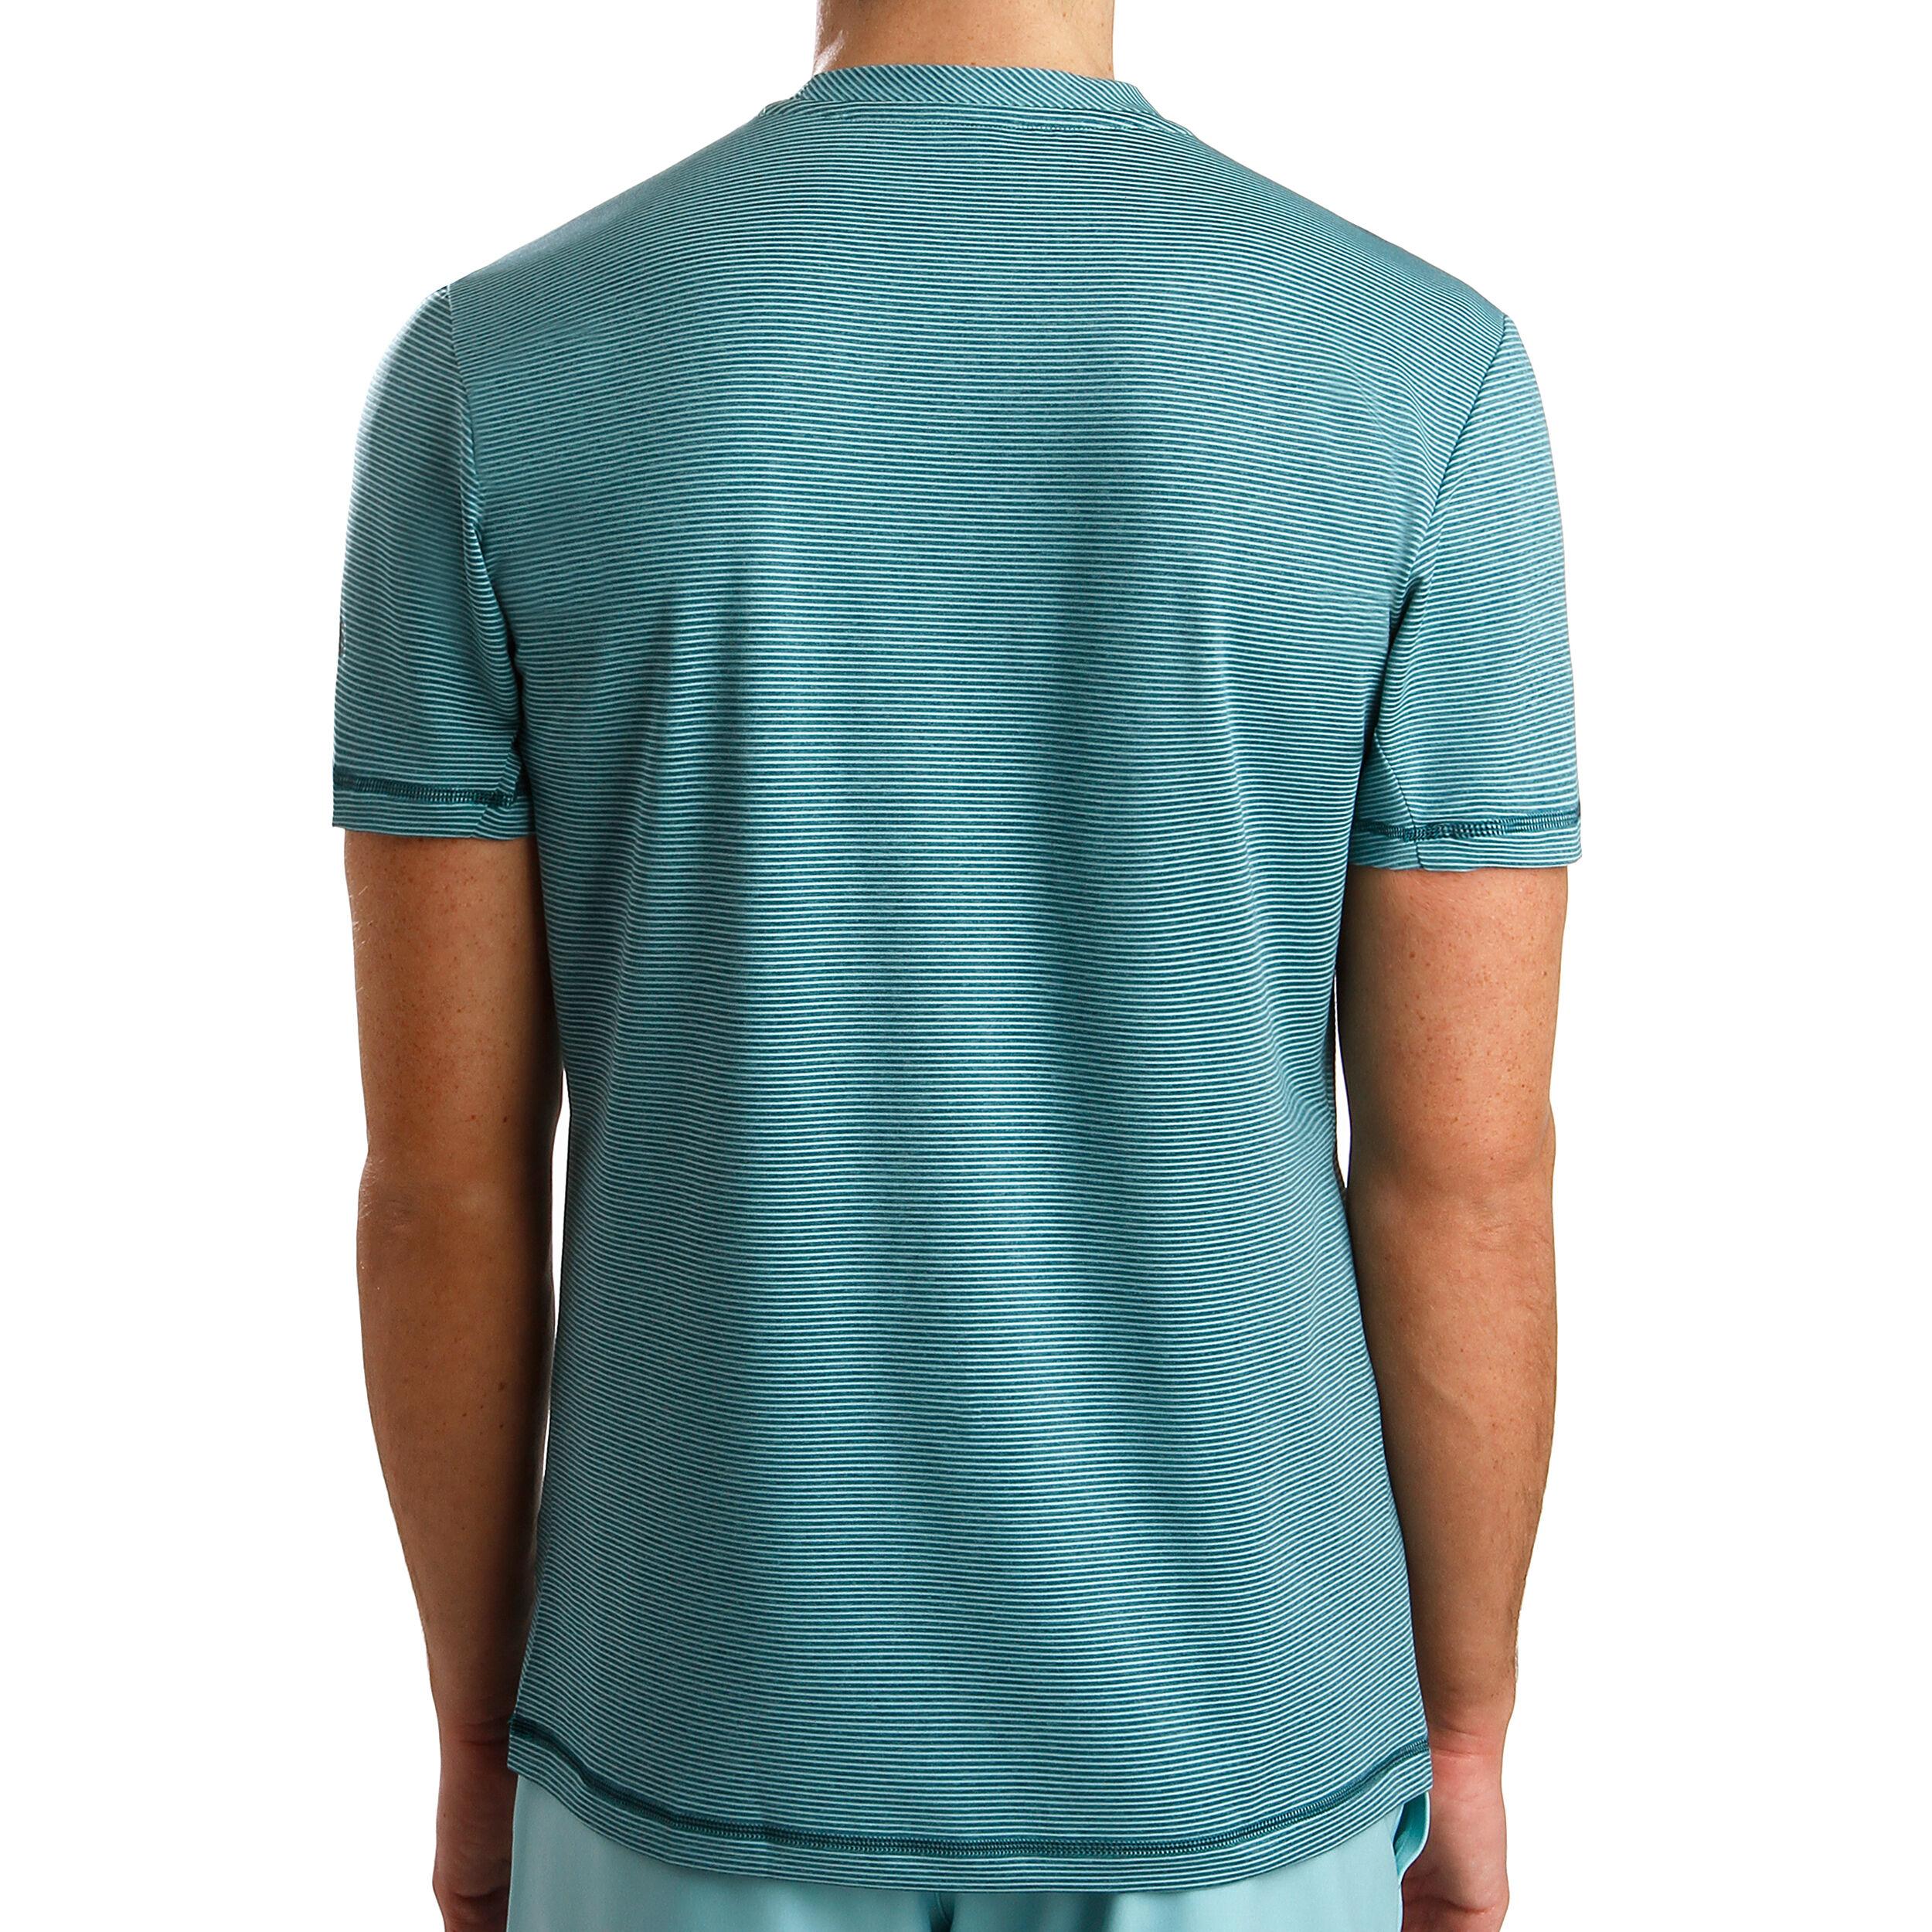 adidas Parley Striped T Shirt Herren Mint, Petrol online